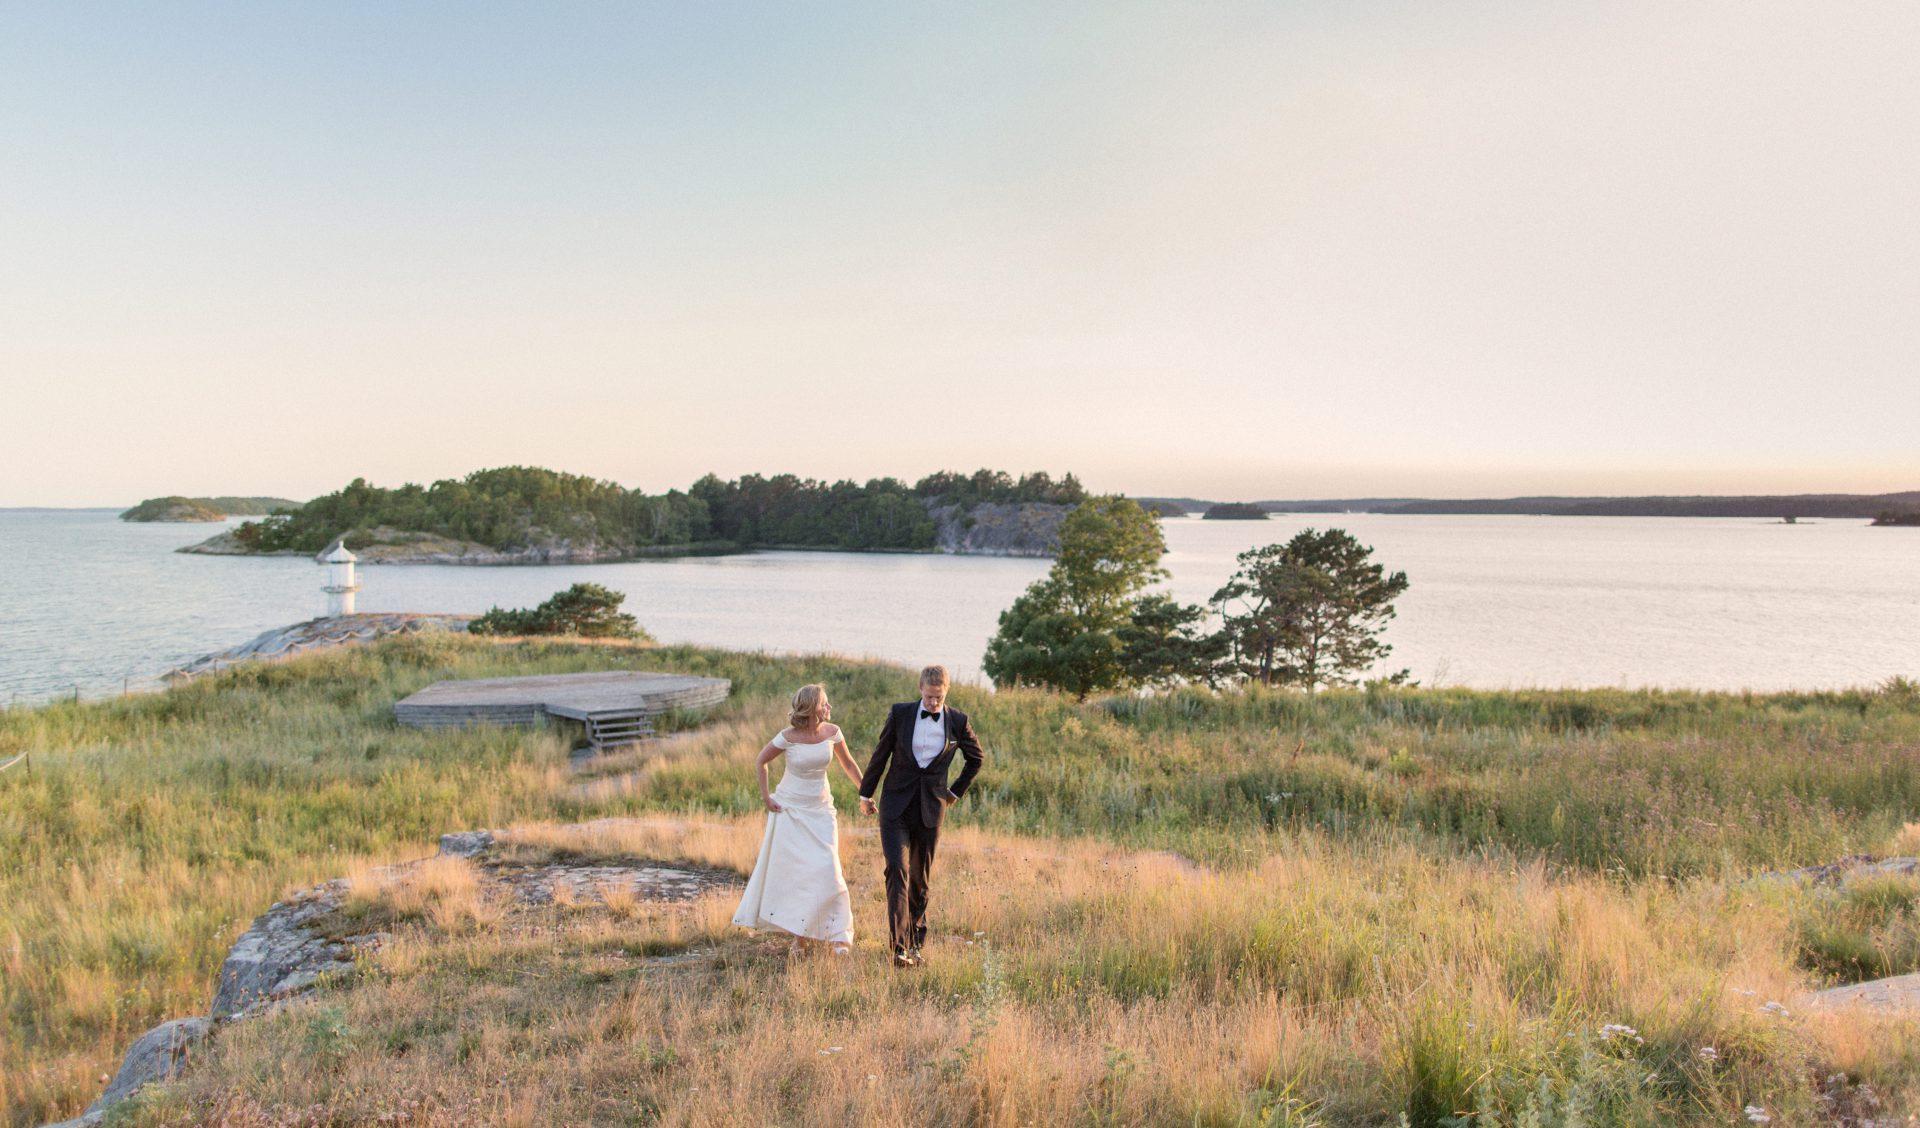 Bröllopsfotograf Lena Larsson jobbar över hela Sverige.      © Lena Larsson